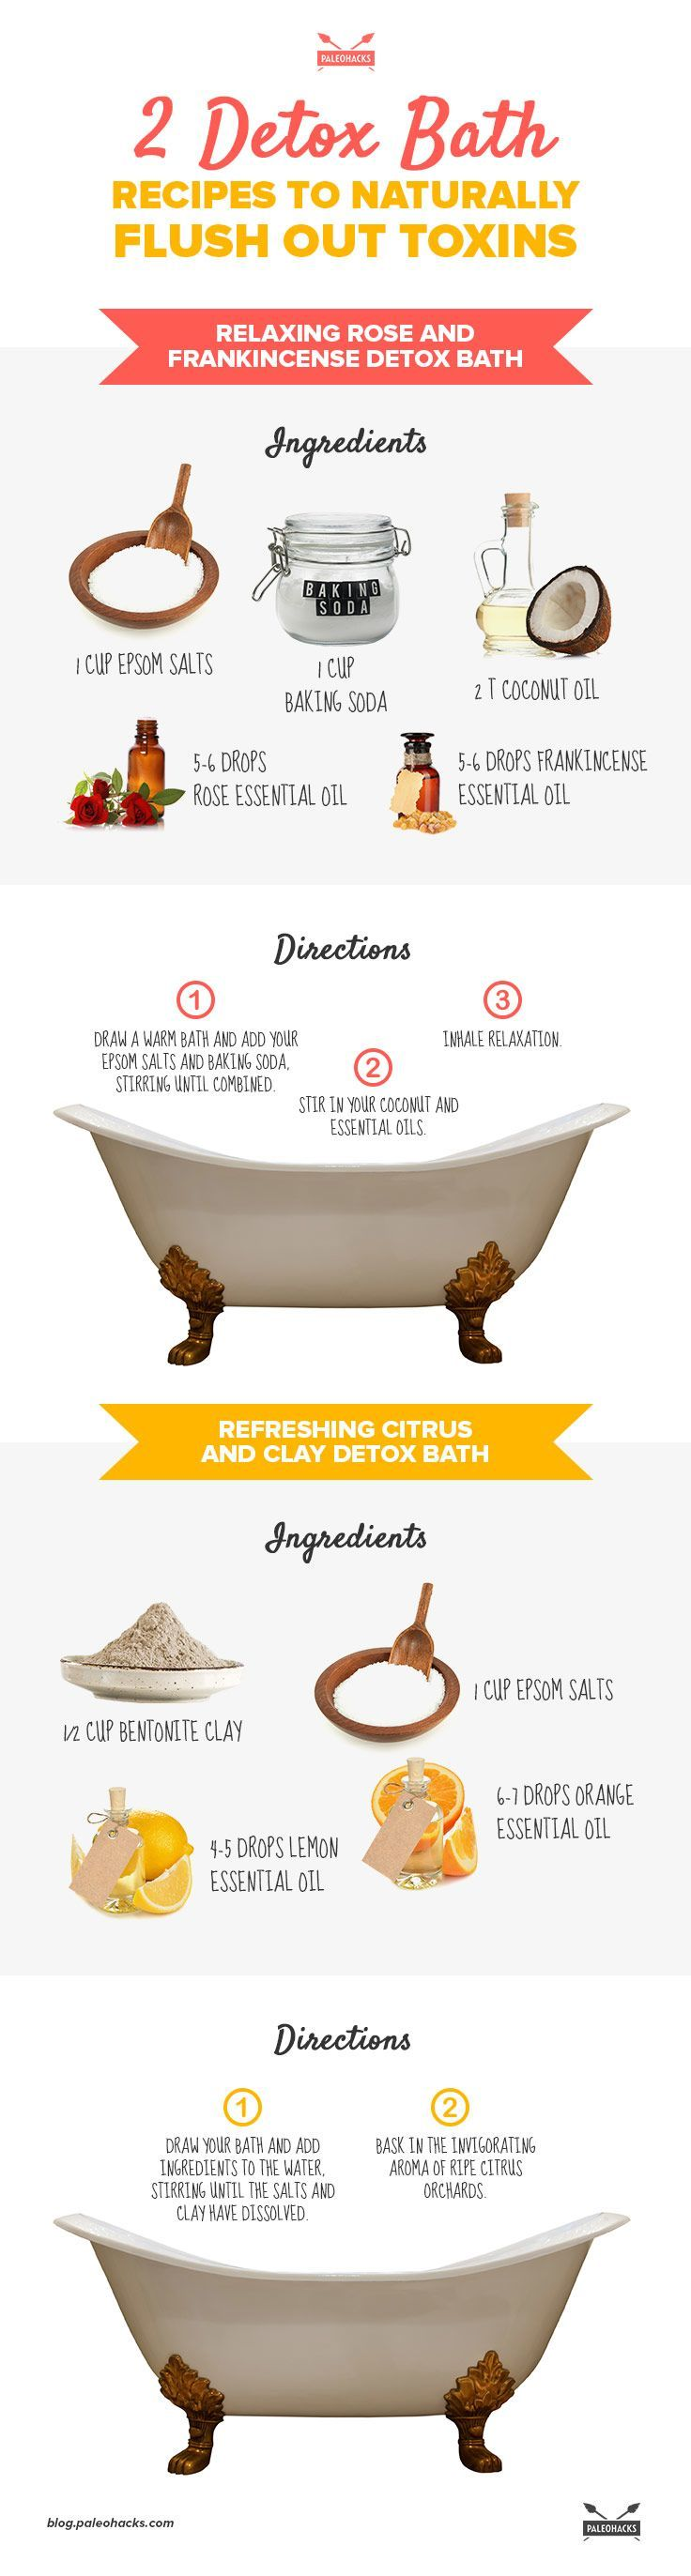 2-Detox-Bath-Recipes-to-Naturally-Flush-Out-Toxins-infog2-1.jpg